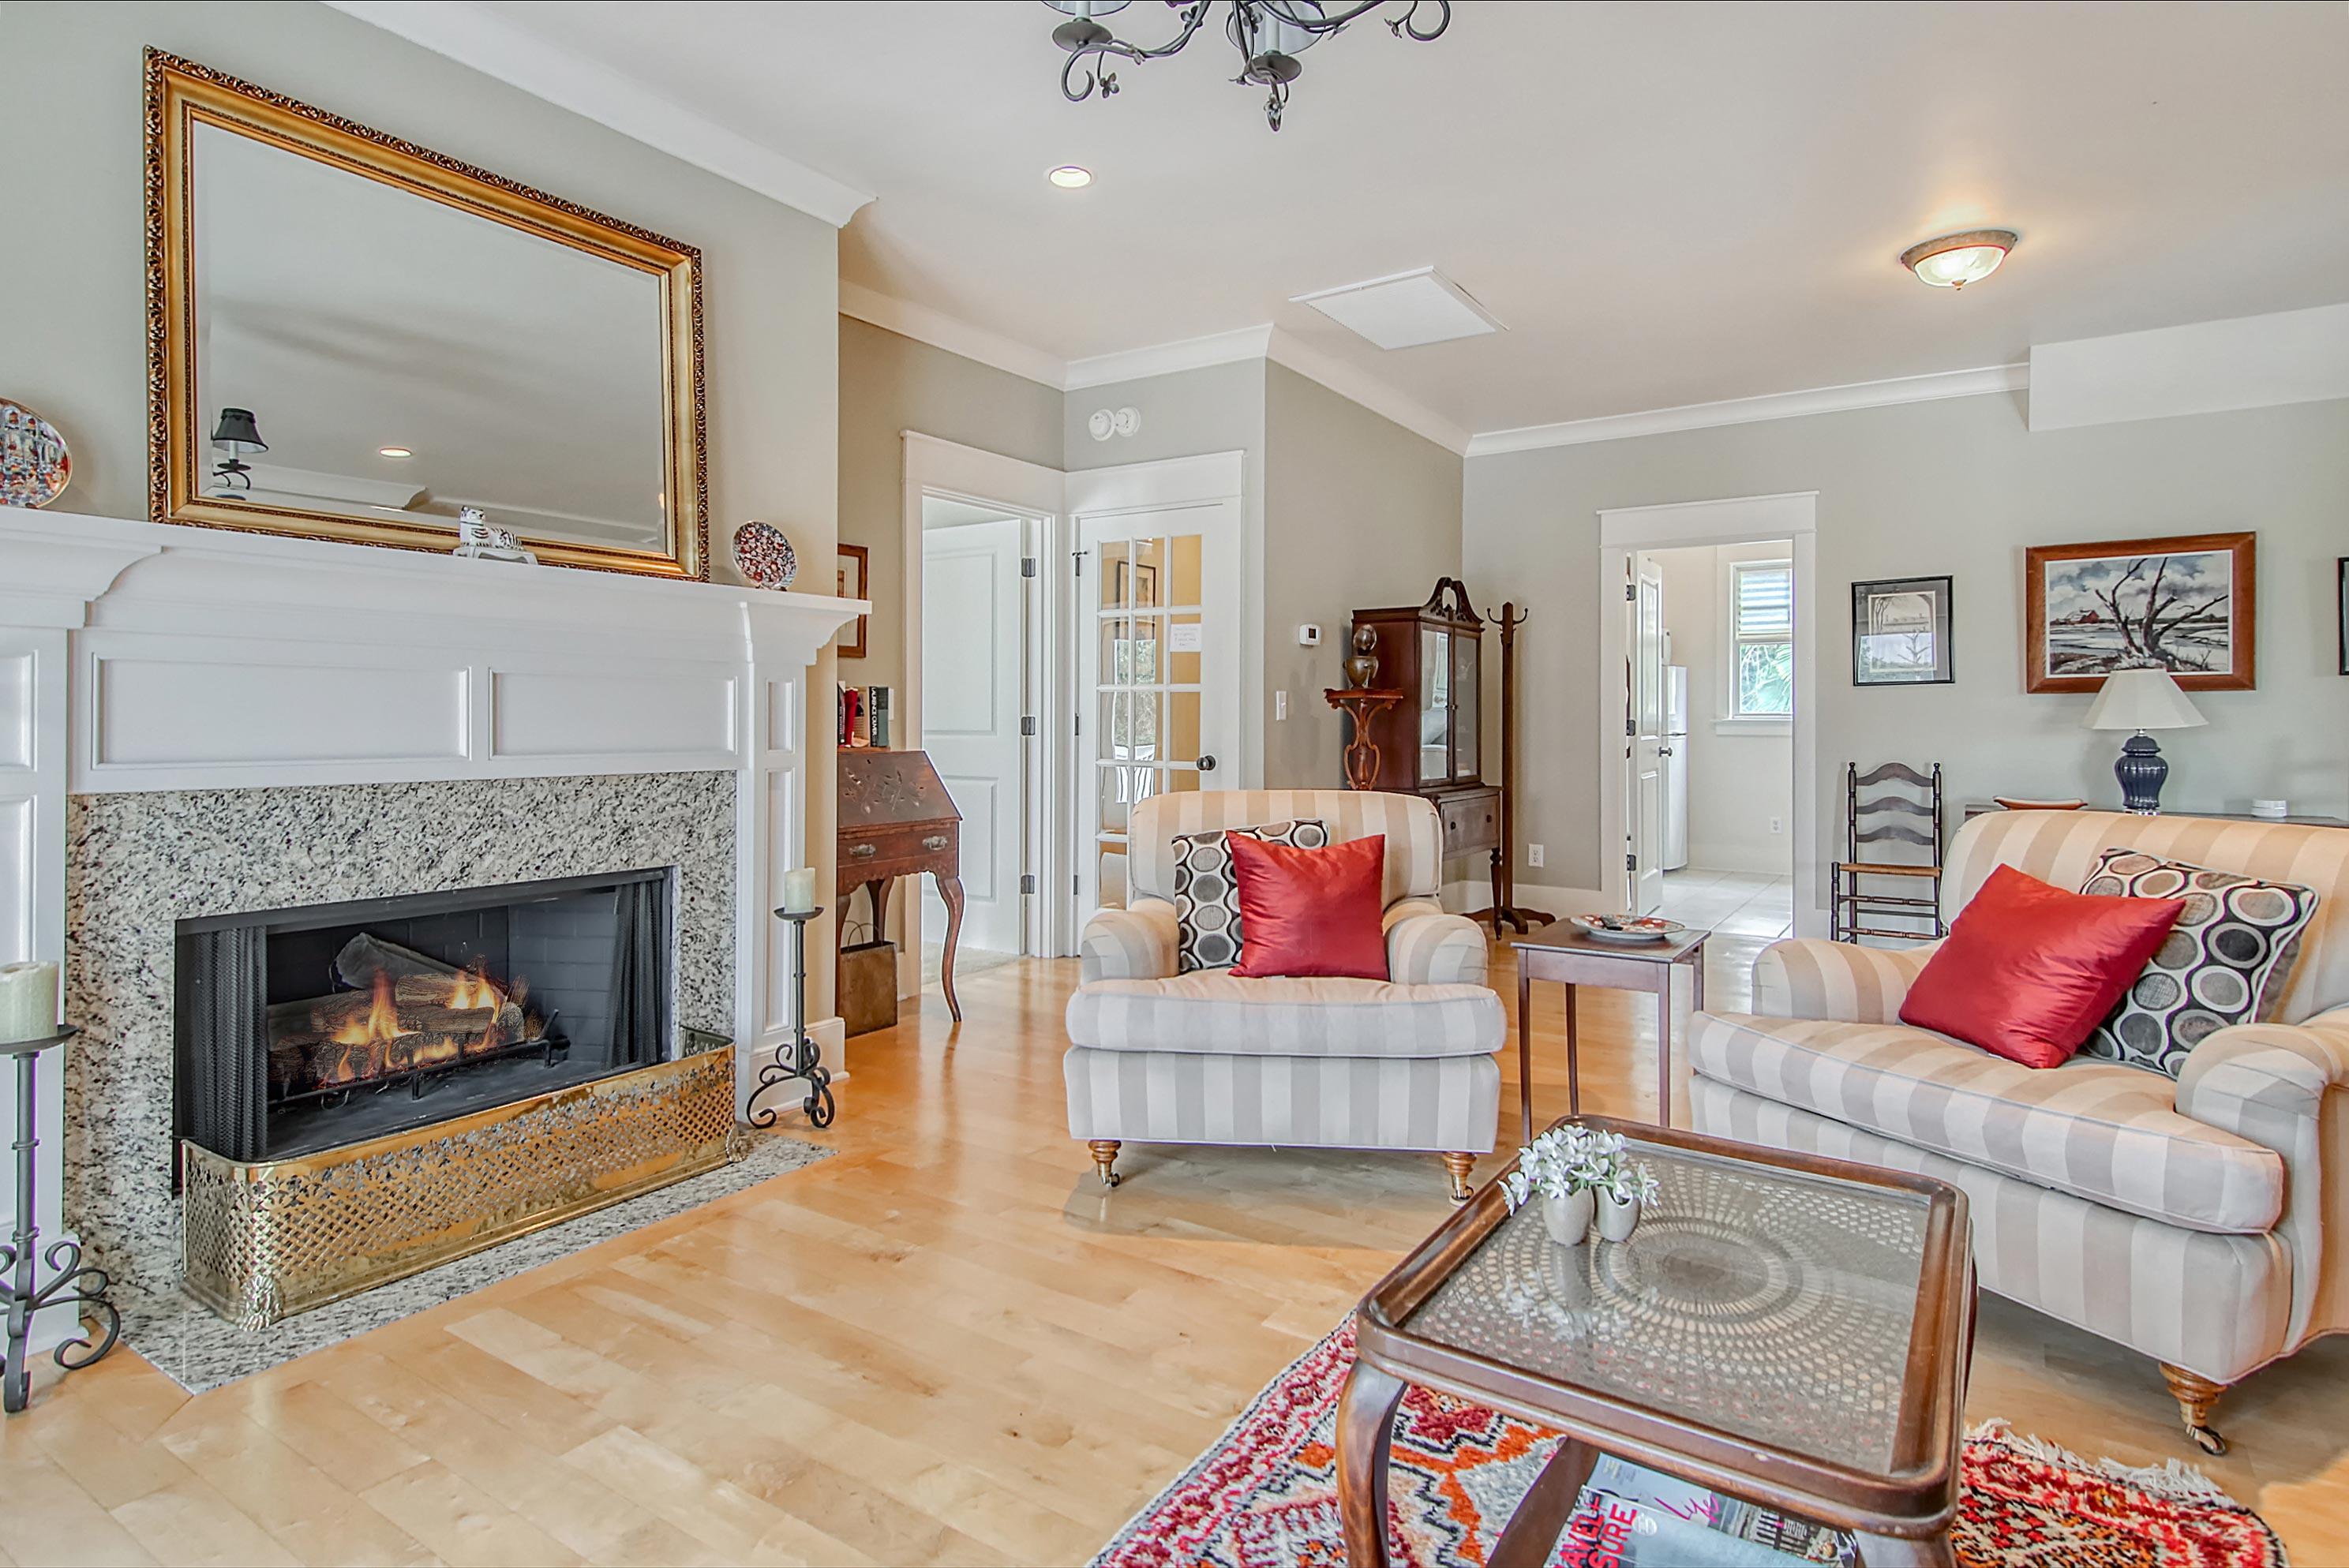 Scanlonville Homes For Sale - 152 6th, Mount Pleasant, SC - 10